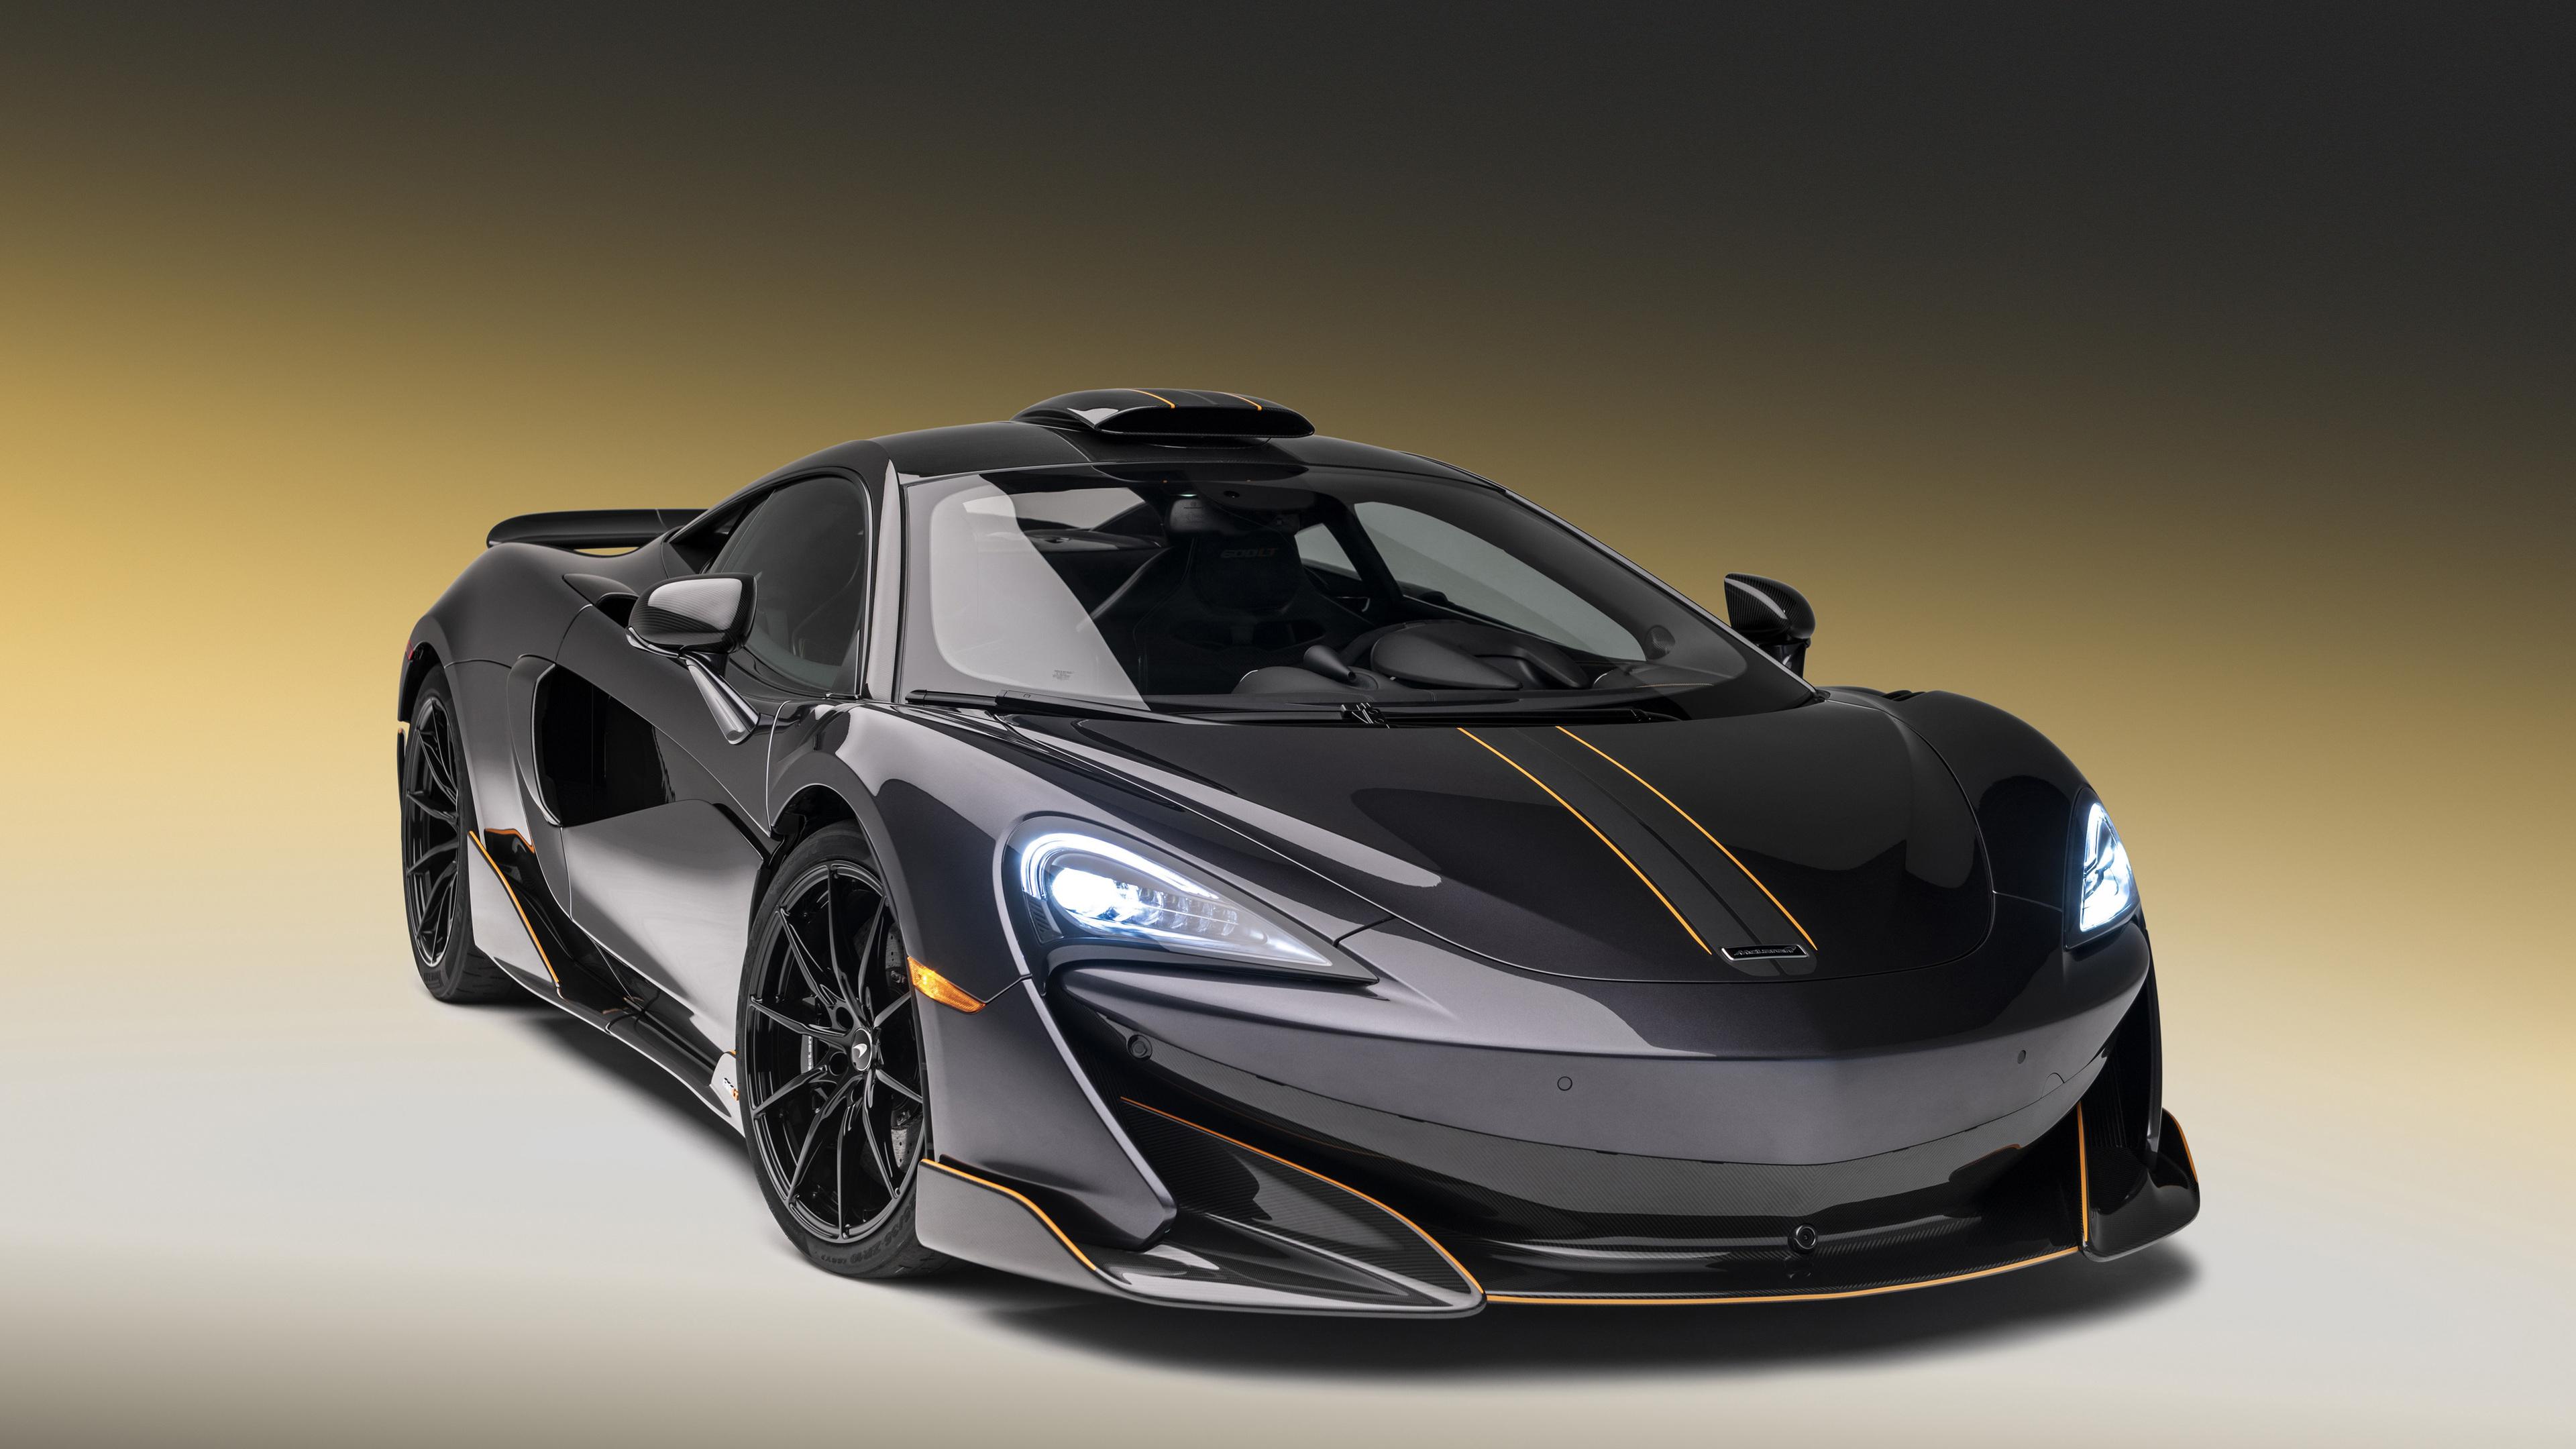 2018 mclaren 600lt 1539113975 - 2018 McLaren 600LT - mclaren wallpapers, mclaren 600lt wallpapers, hd-wallpapers, cars wallpapers, 4k-wallpapers, 2018 cars wallpapers